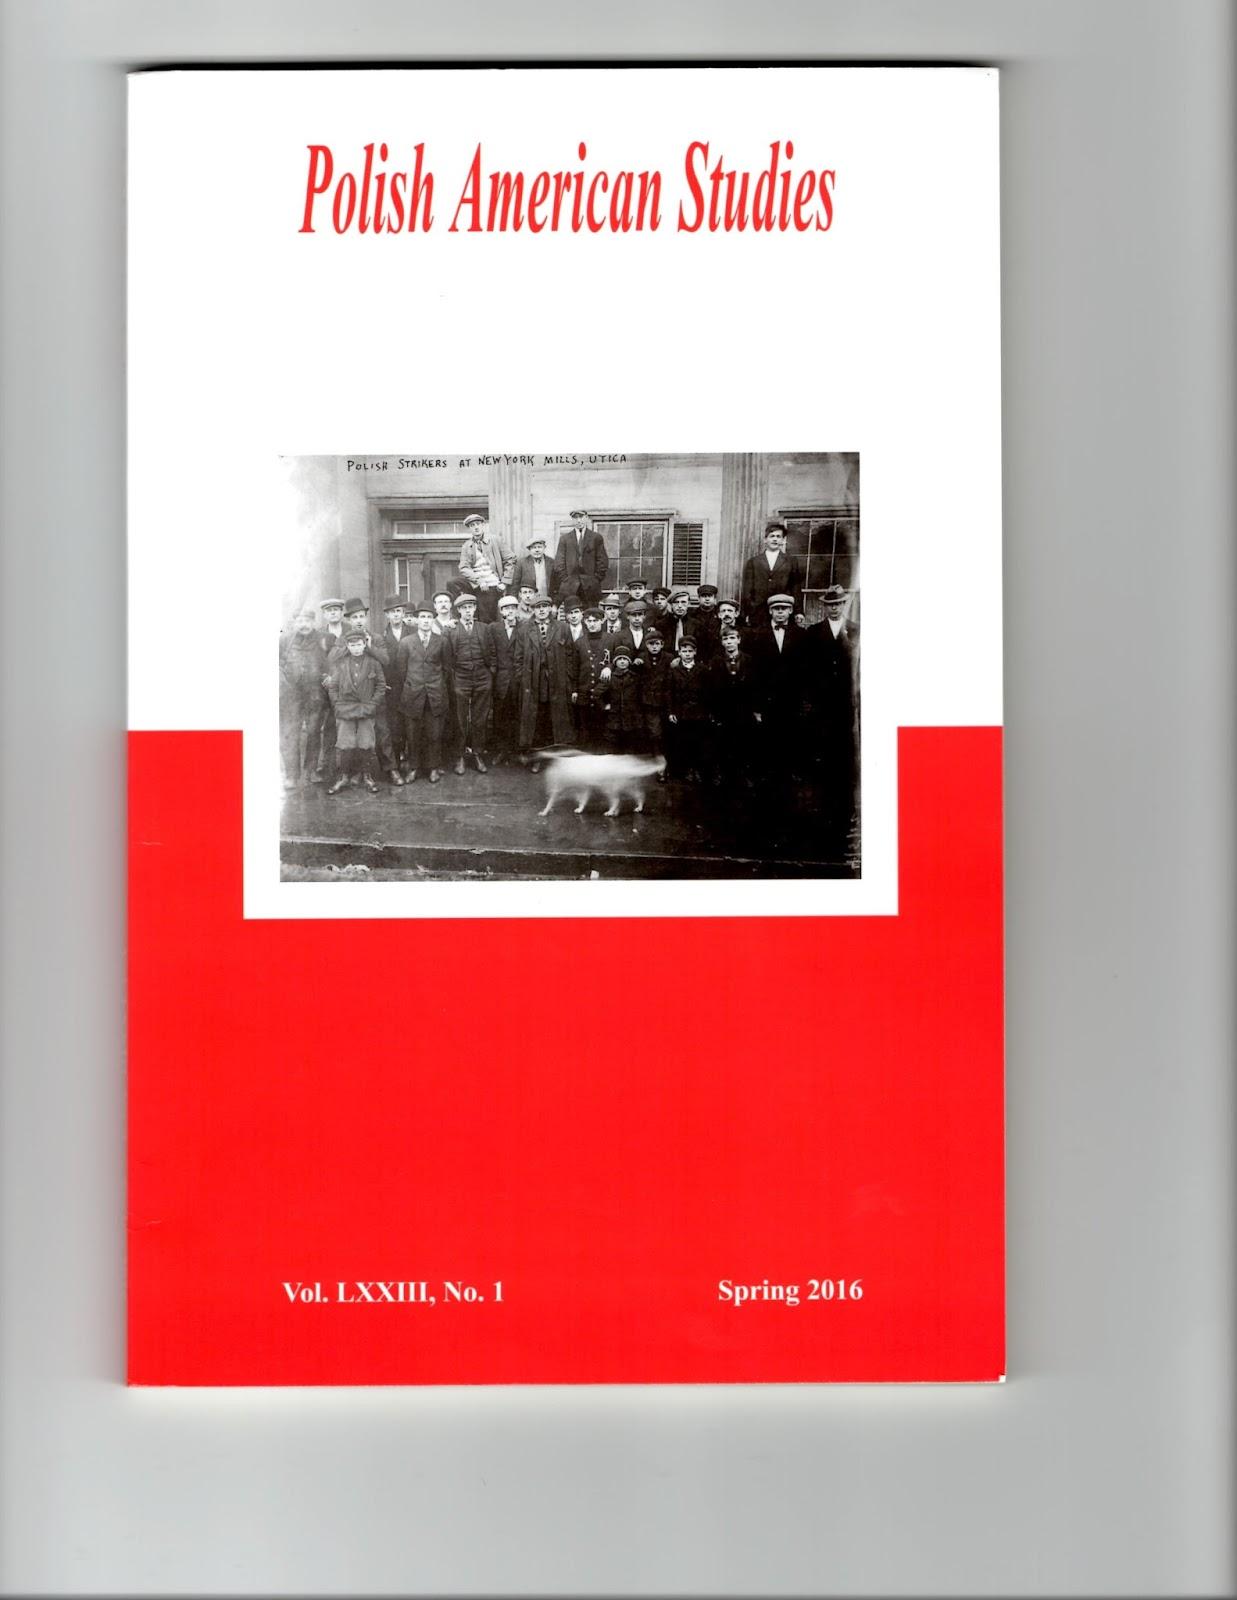 Polish American Studies Vol 73, No 2 (fall 2016):